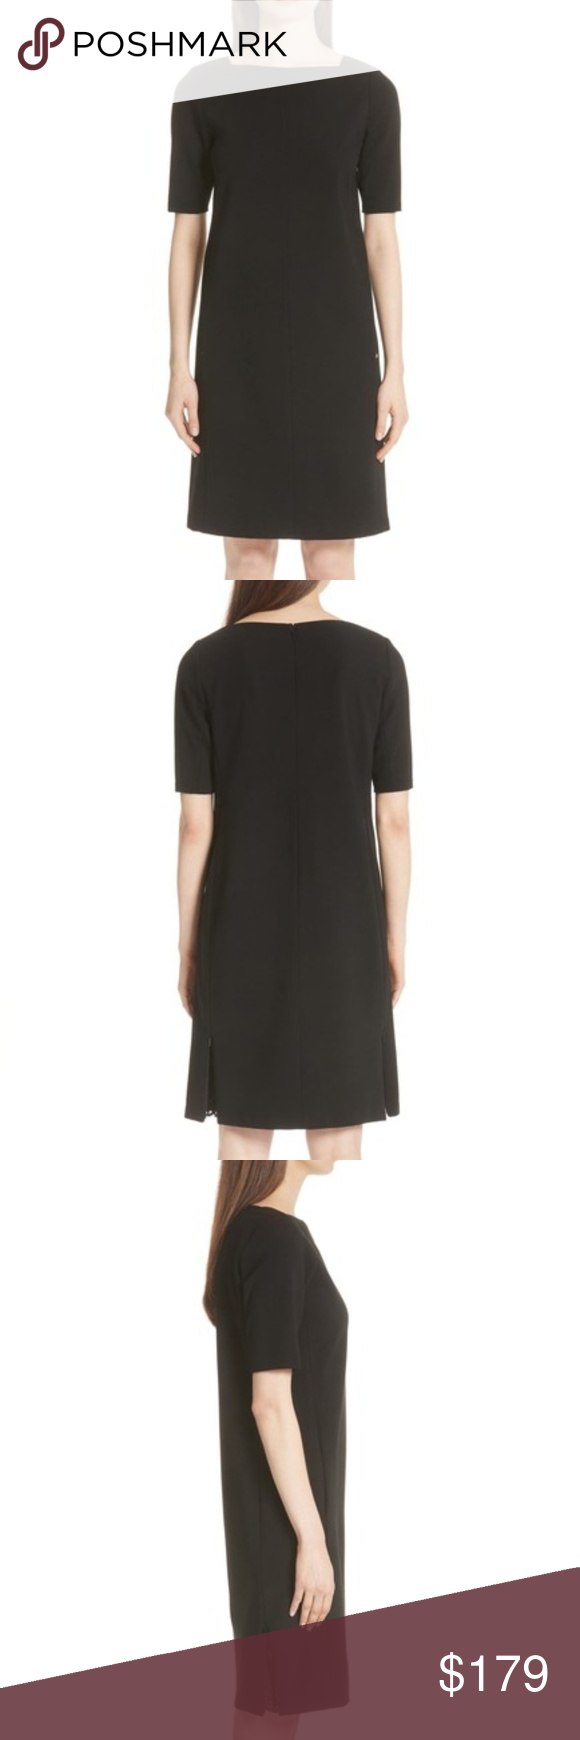 Lafayette 148 Ny Cyra Lace Panel Black Dress Xl Clothes Design Black Dress Lace Panelled [ 1740 x 580 Pixel ]